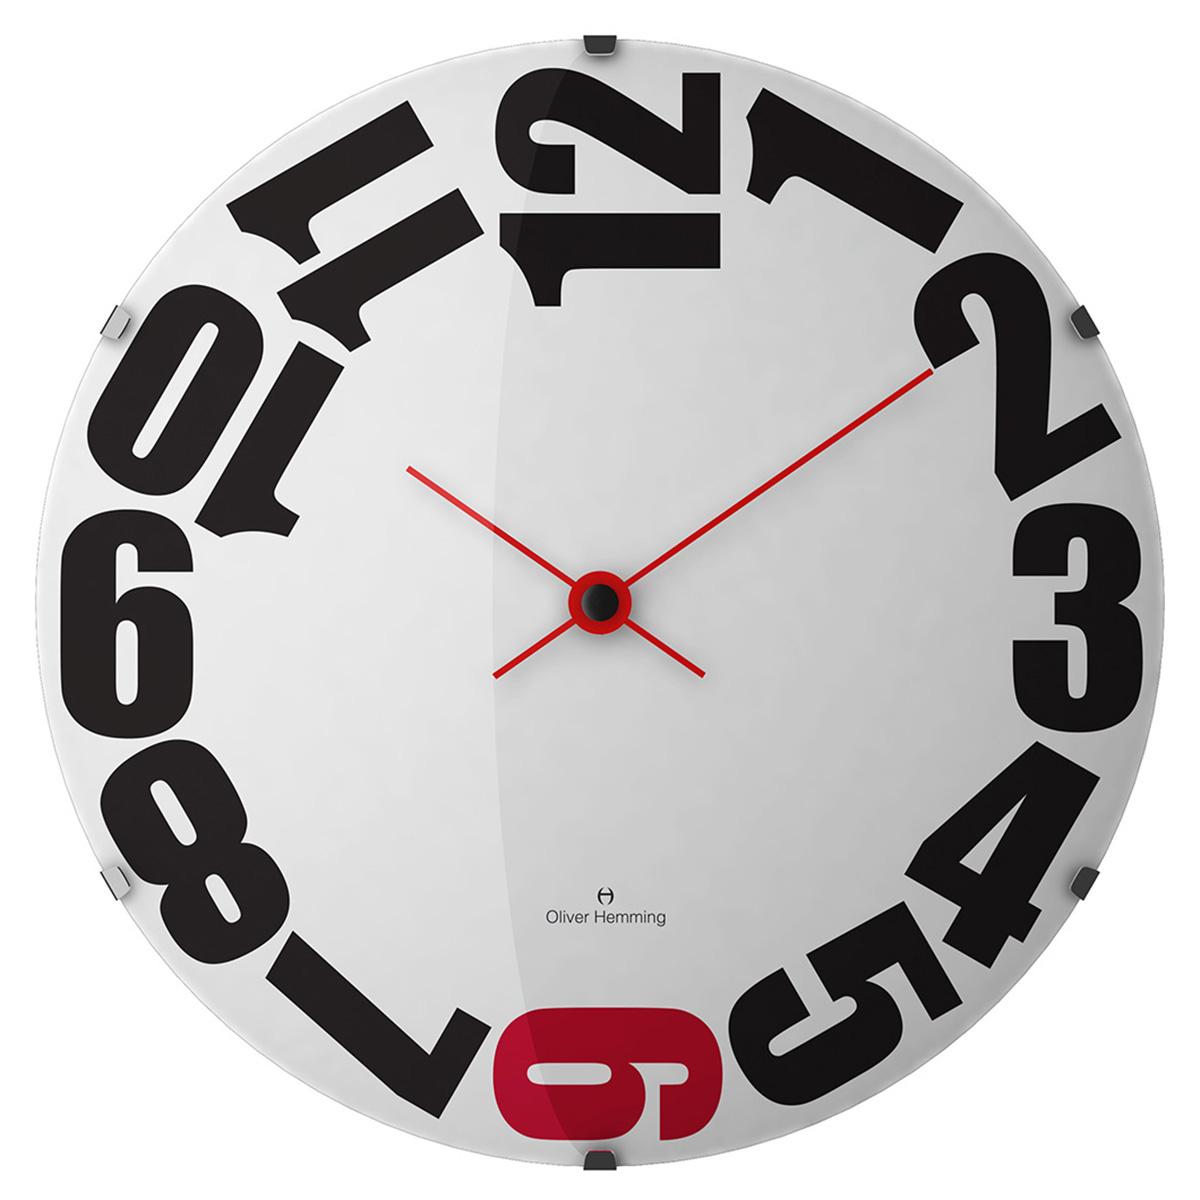 Oliver Hemming オリバーヘミング 壁掛け時計 Vitri Domed Glass ヴィトリドームガラス 500mm [W500DG20WR] 正規品